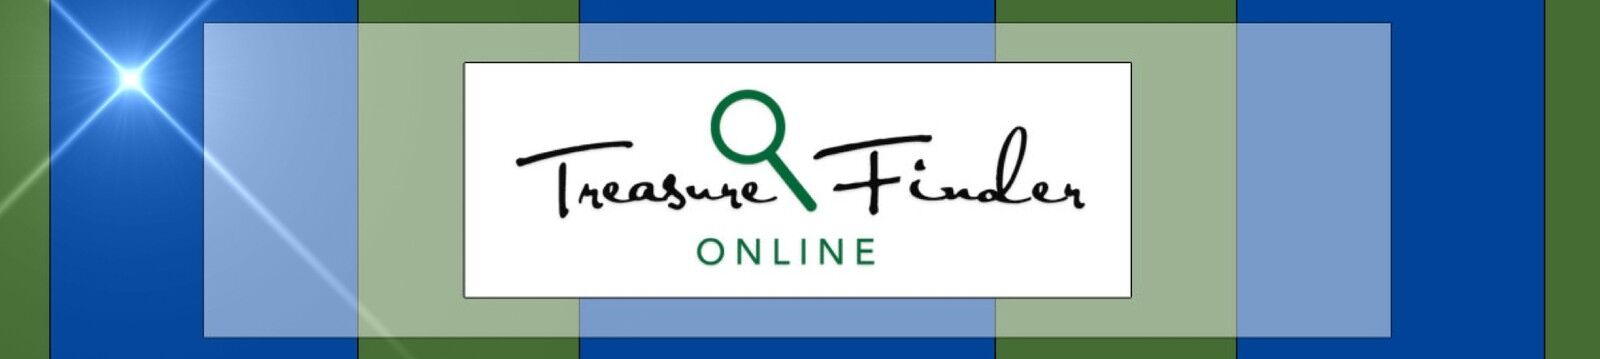 Treasure Finder Online